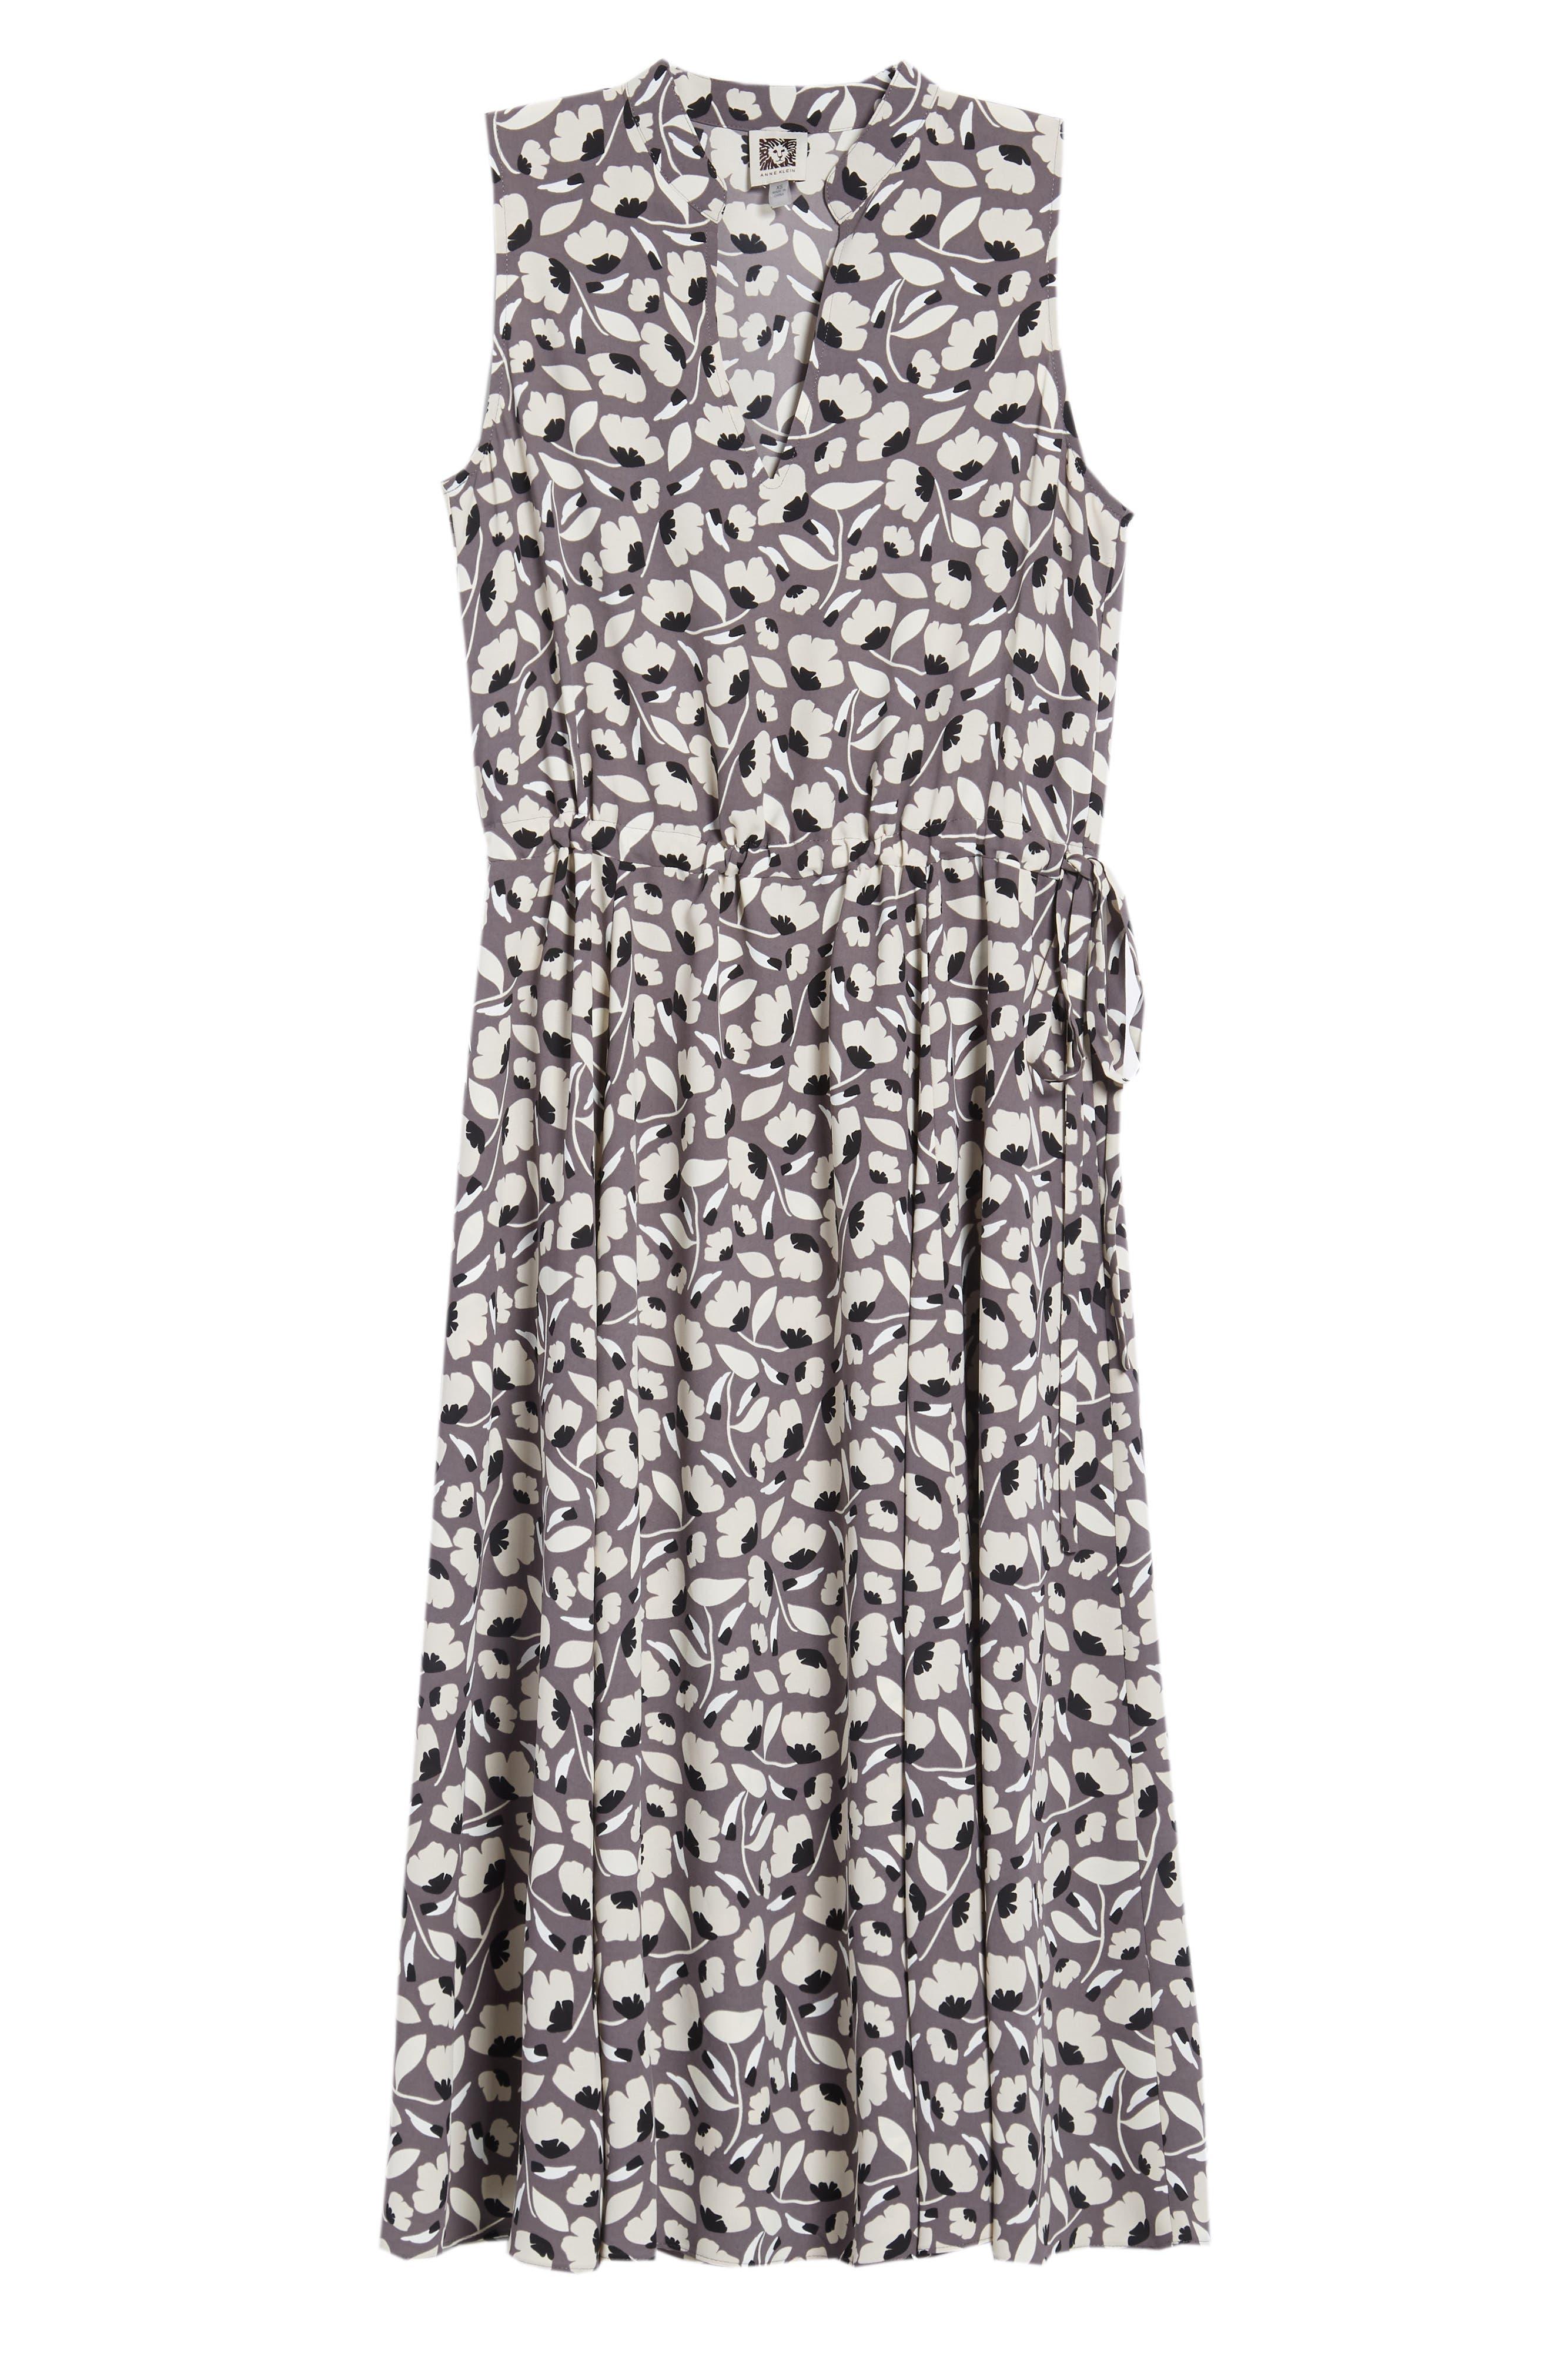 Floral Drawstring Dress,                             Alternate thumbnail 7, color,                             Nantucket Grey/ Oyster Shell